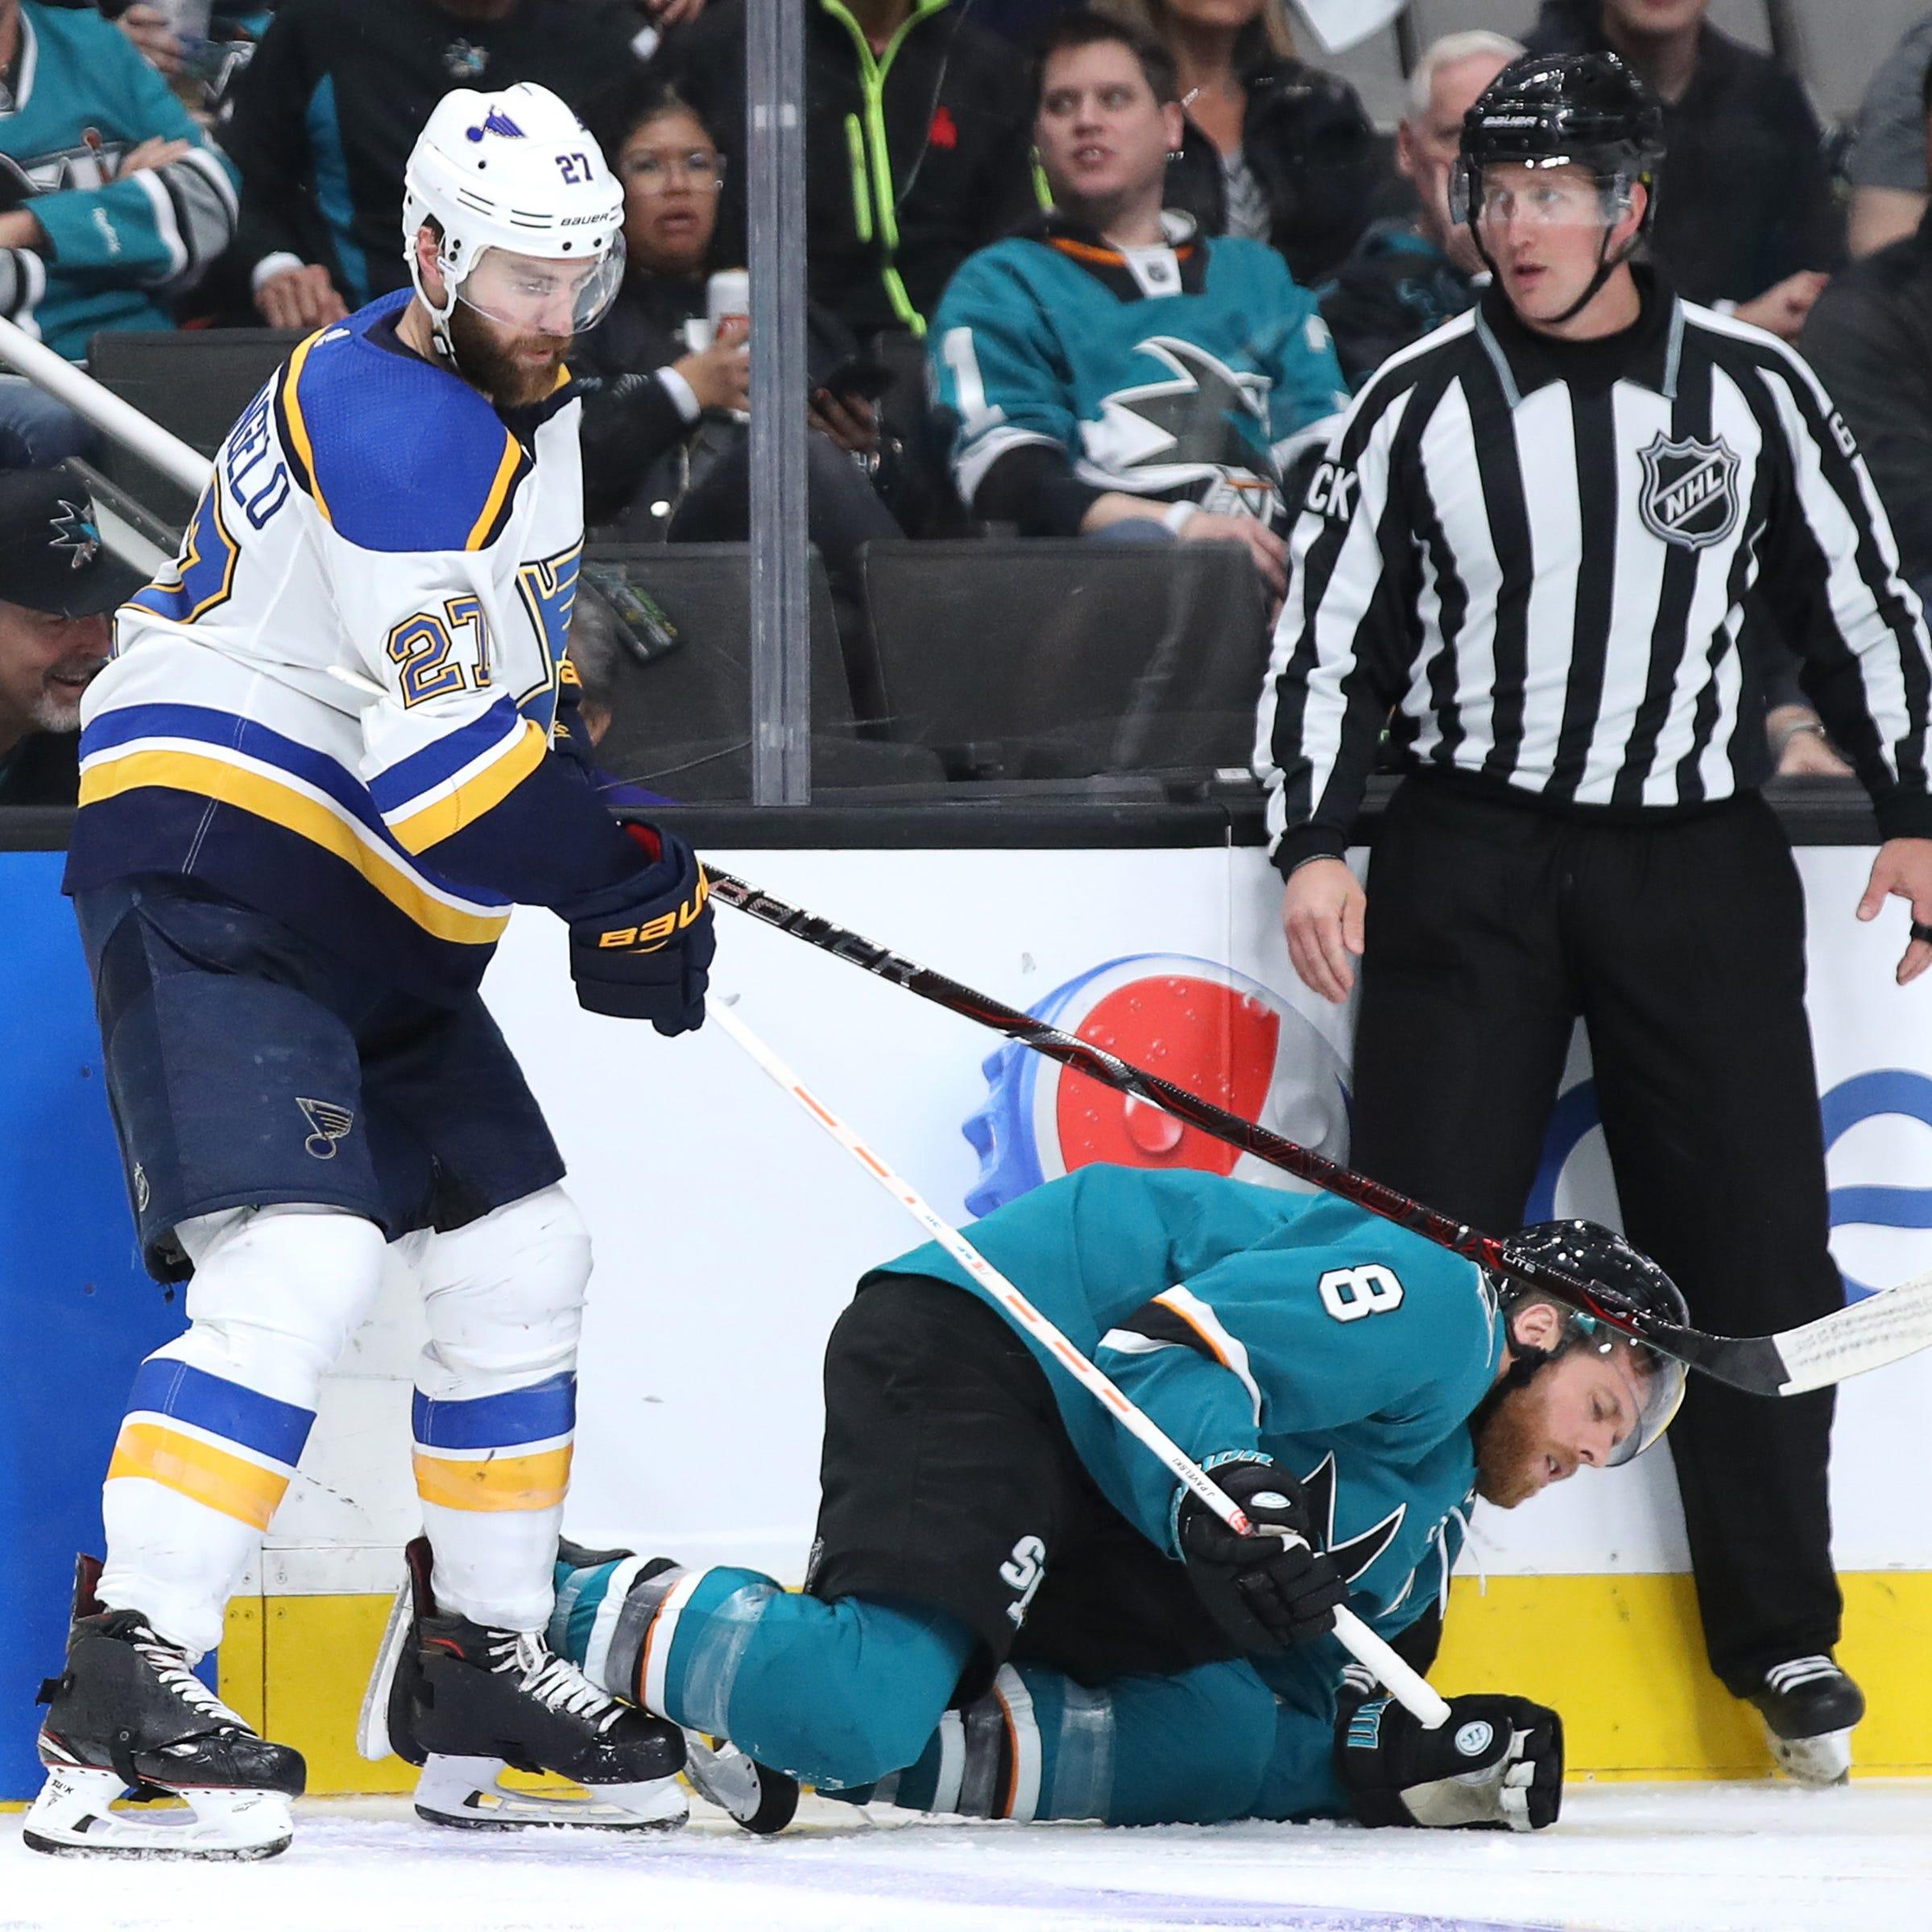 Sharks center Joe Pavelski lies on the ice after a hit by Blues defenseman Alex Pietrangelo.